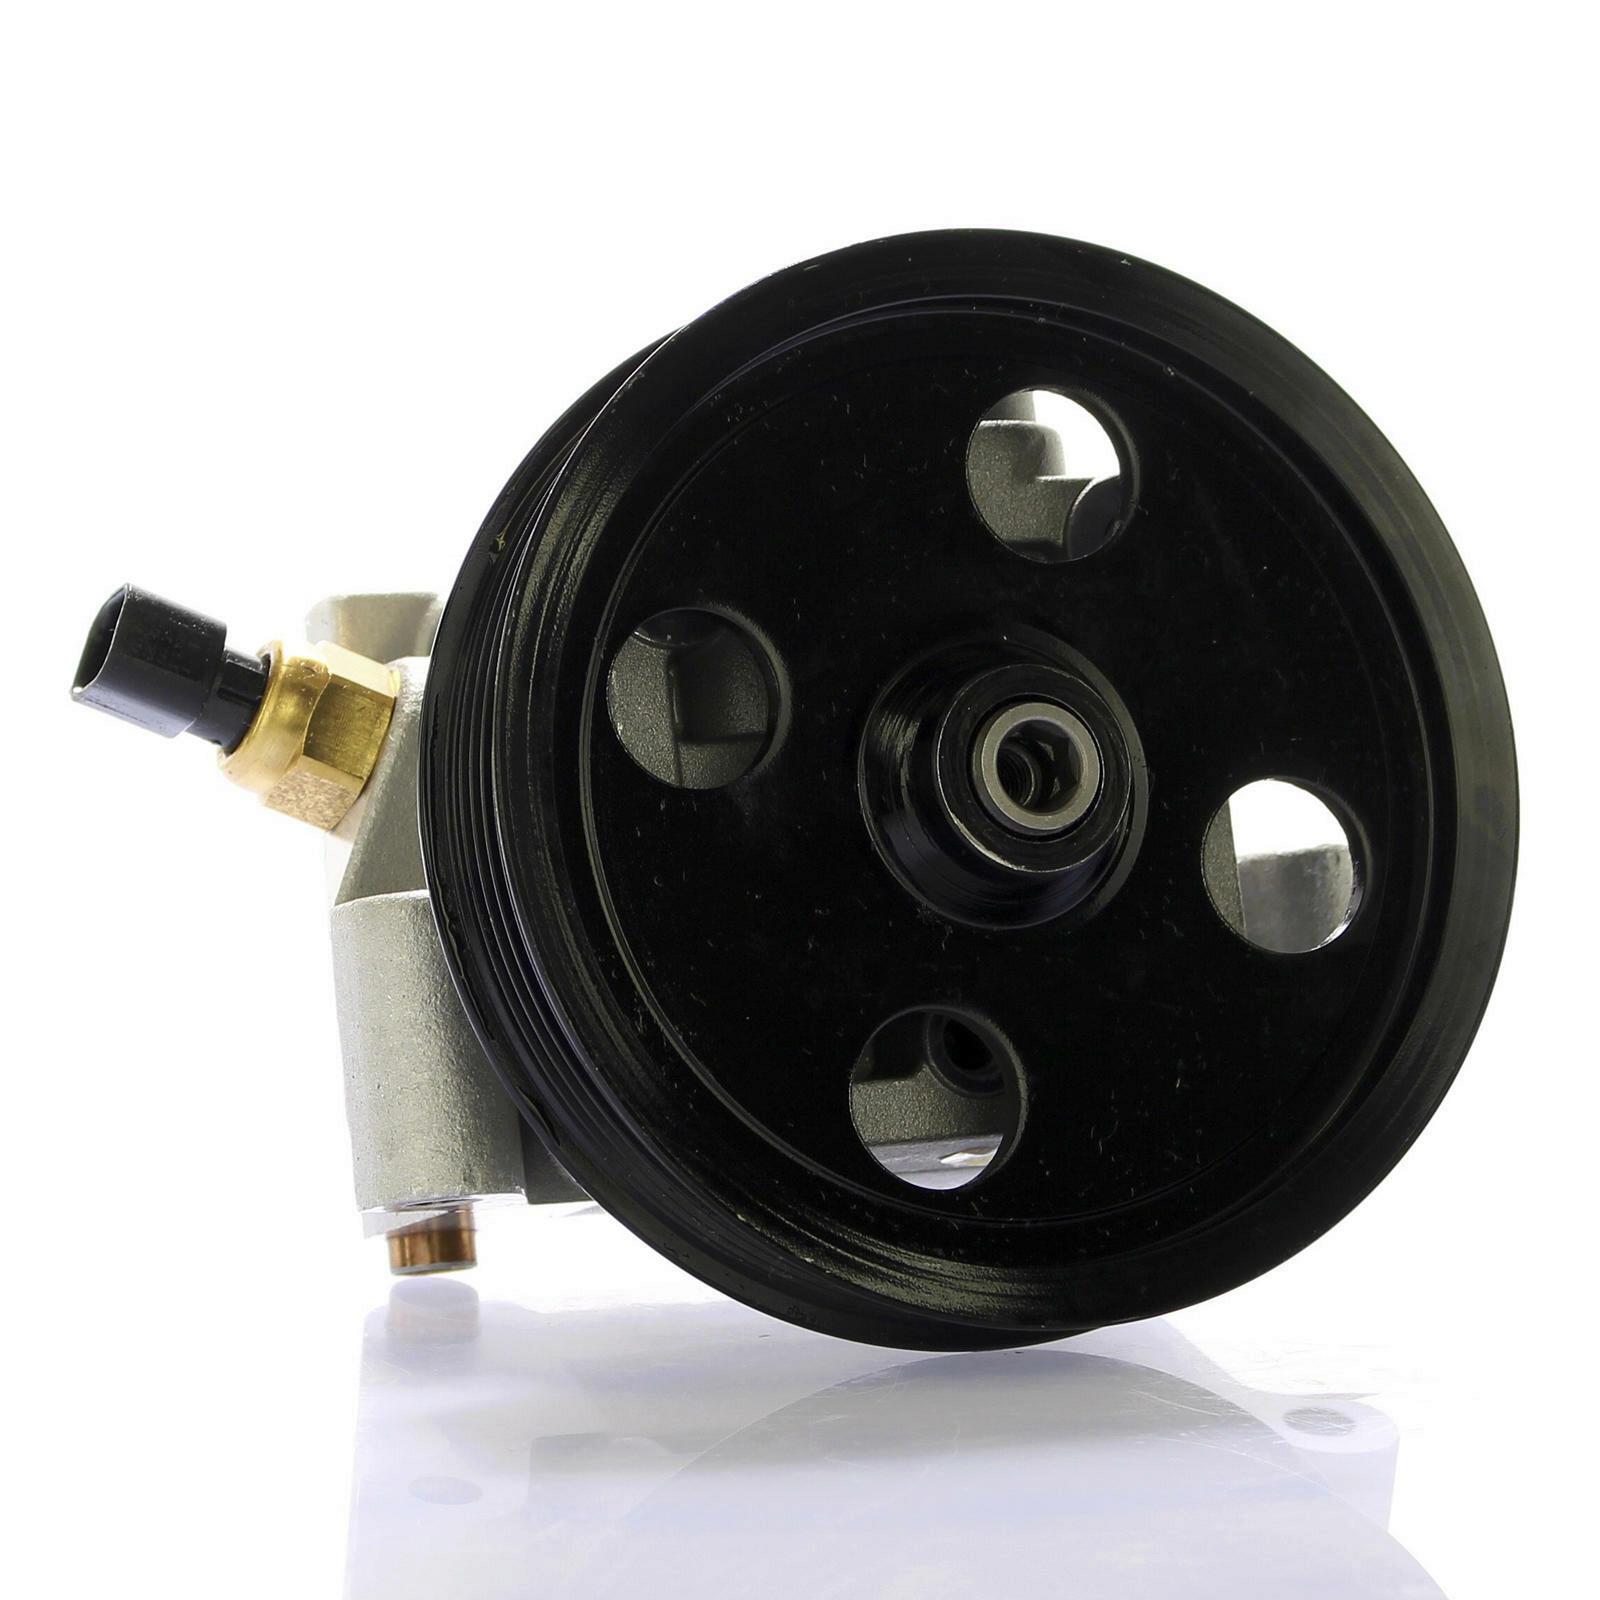 Servopumpe Hydraulikpumpe für FORD Focus / C-MAX // VOLVO 1.6 C30 / S40 / V50